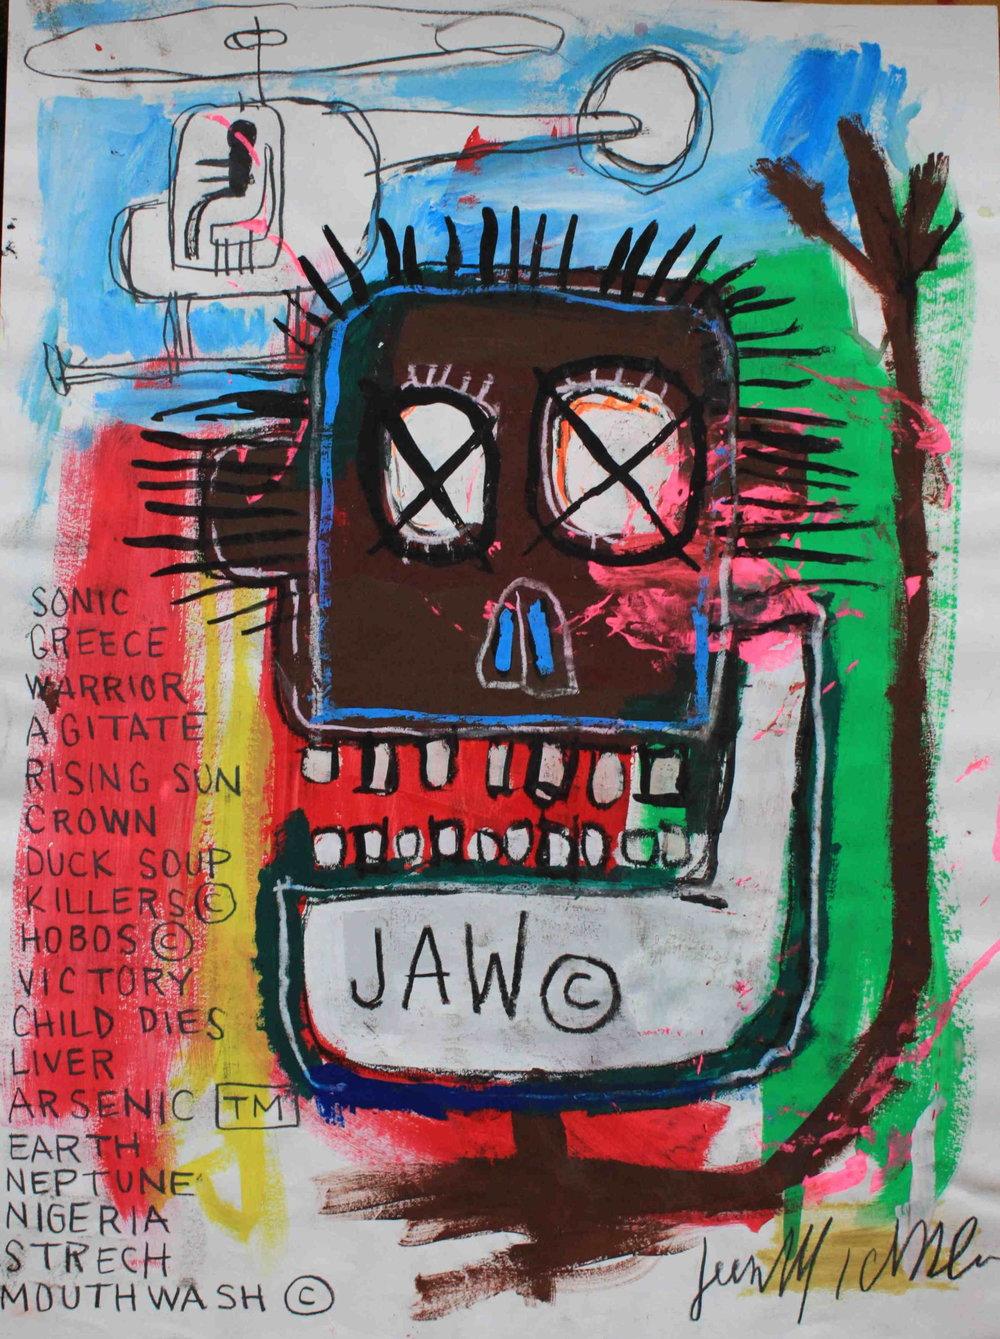 Jean-Michel Basquiat, obra assinada, 1981